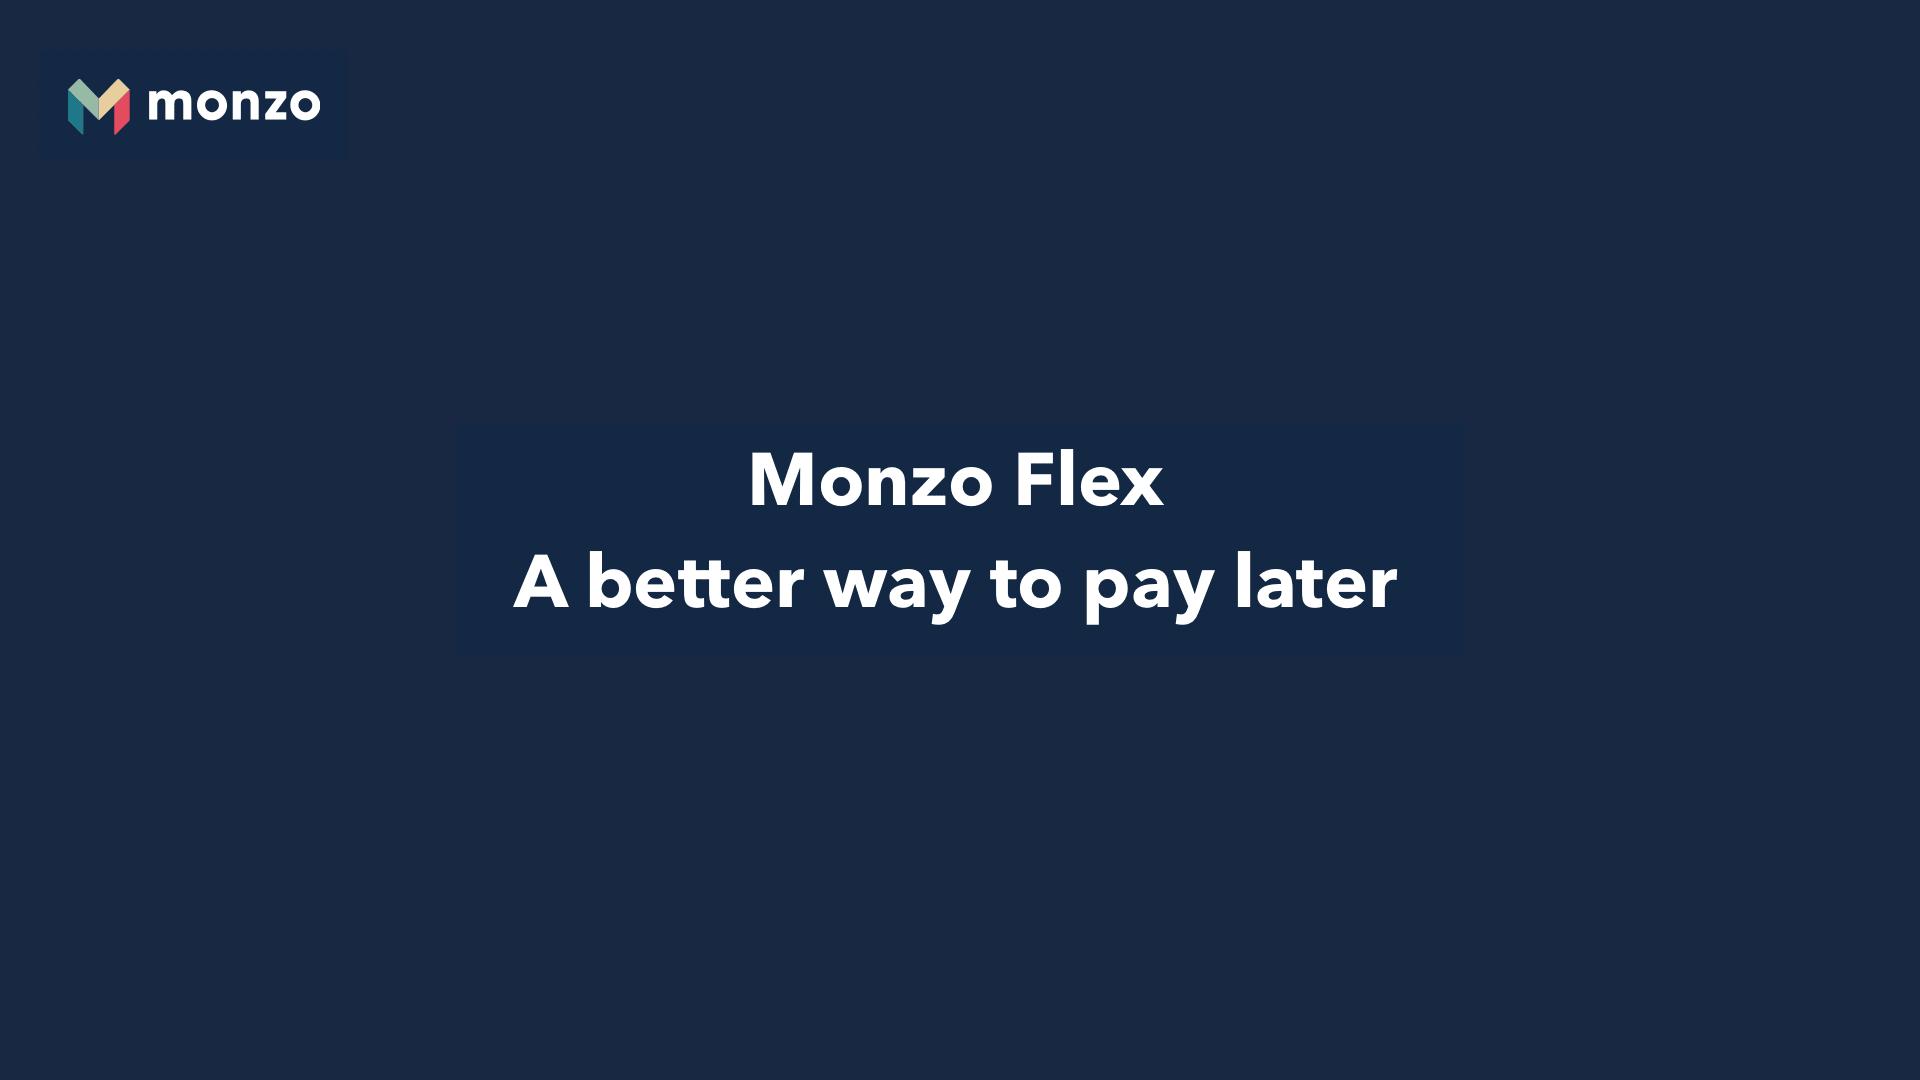 Monzo Flex